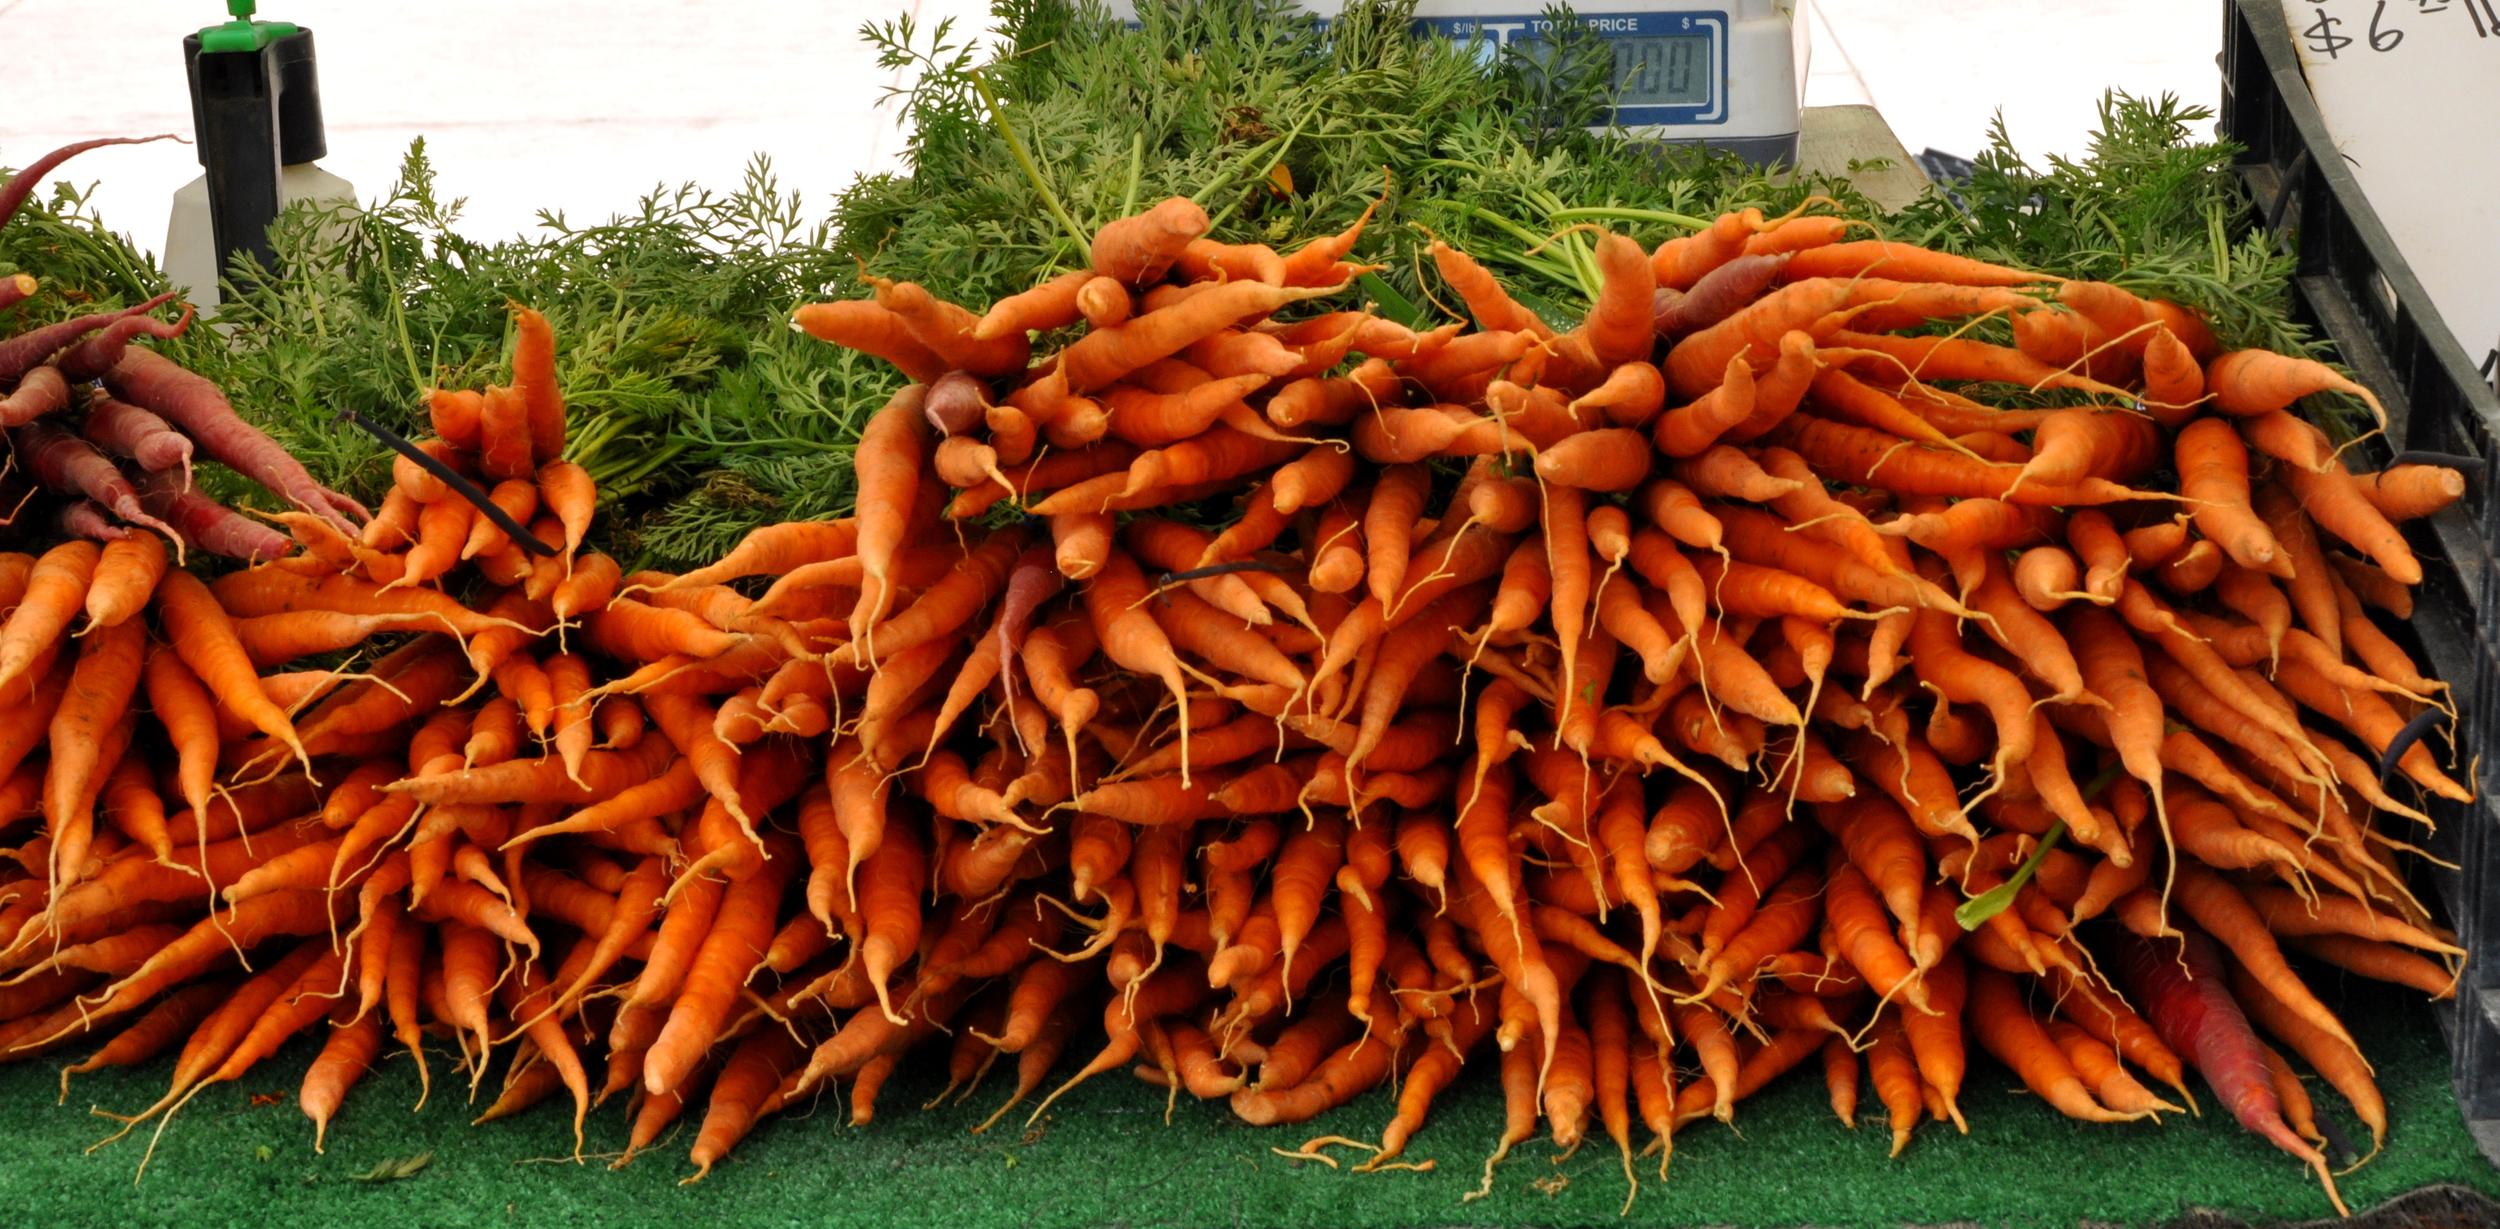 Carrots at the Hollywood Farmers Market  ©Copyright 2015 Bridget Barnes